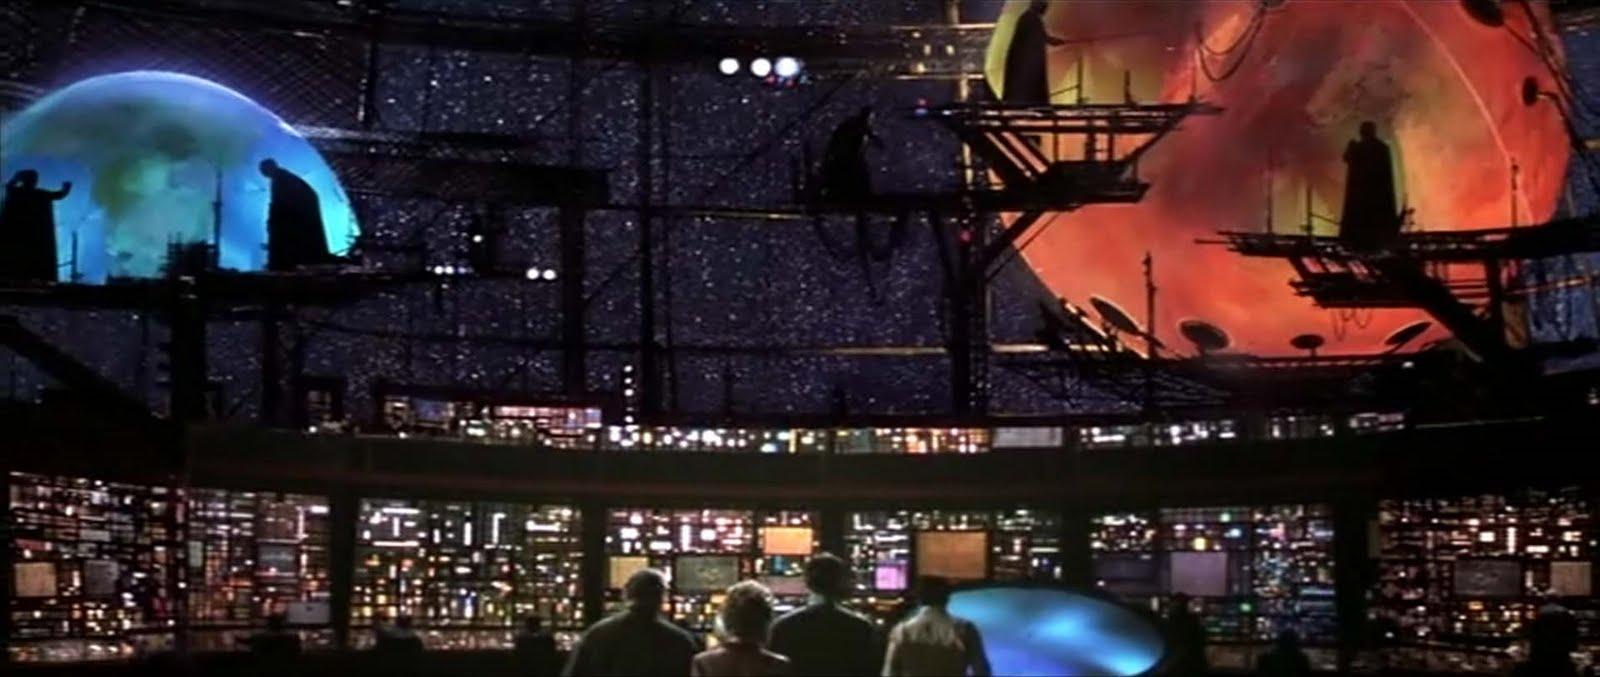 black hole movie ship - photo #24